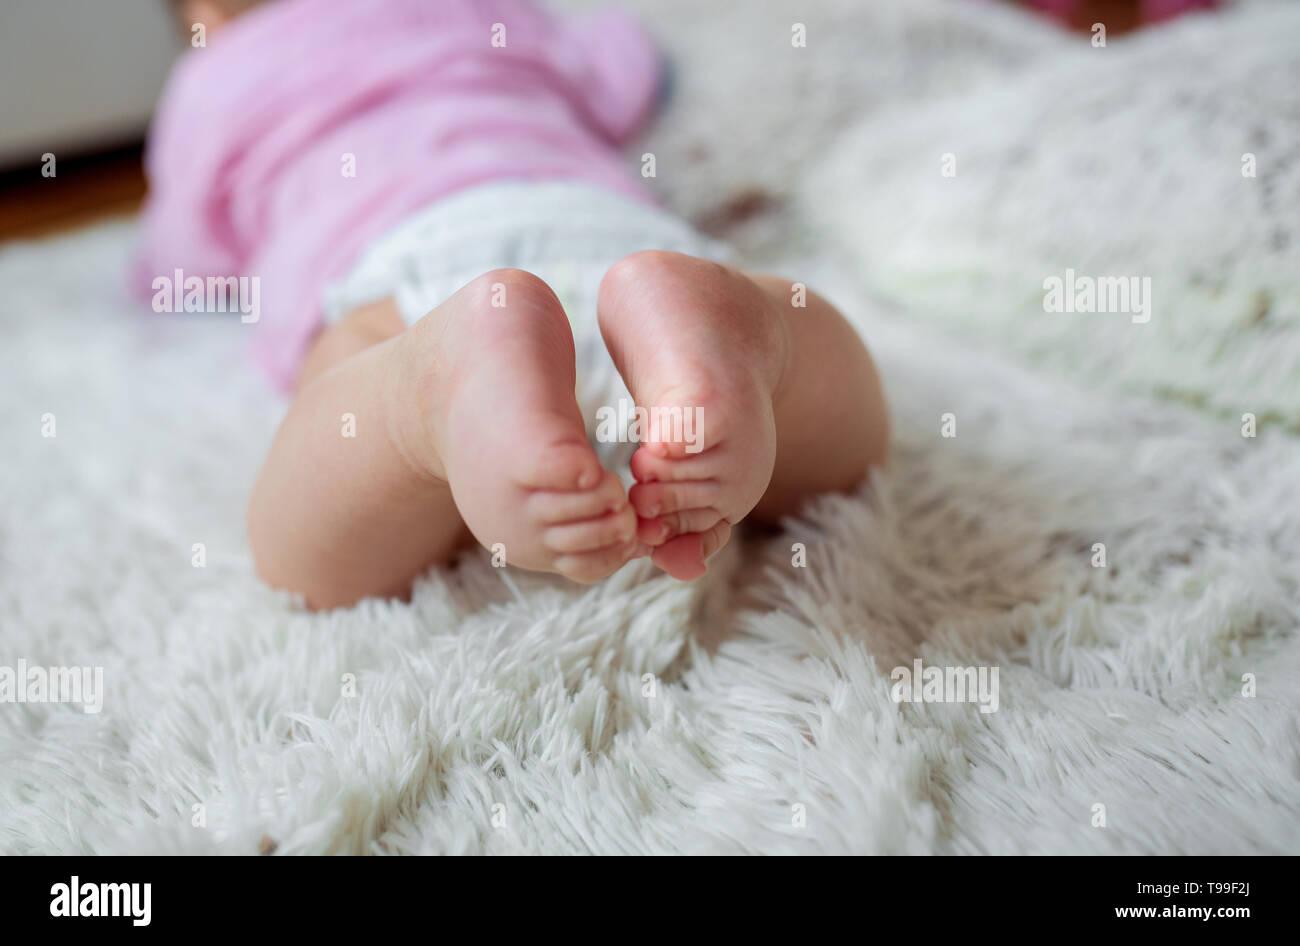 Newborn Baby feet - baby's legs, feet of a newborn baby. - Stock Image